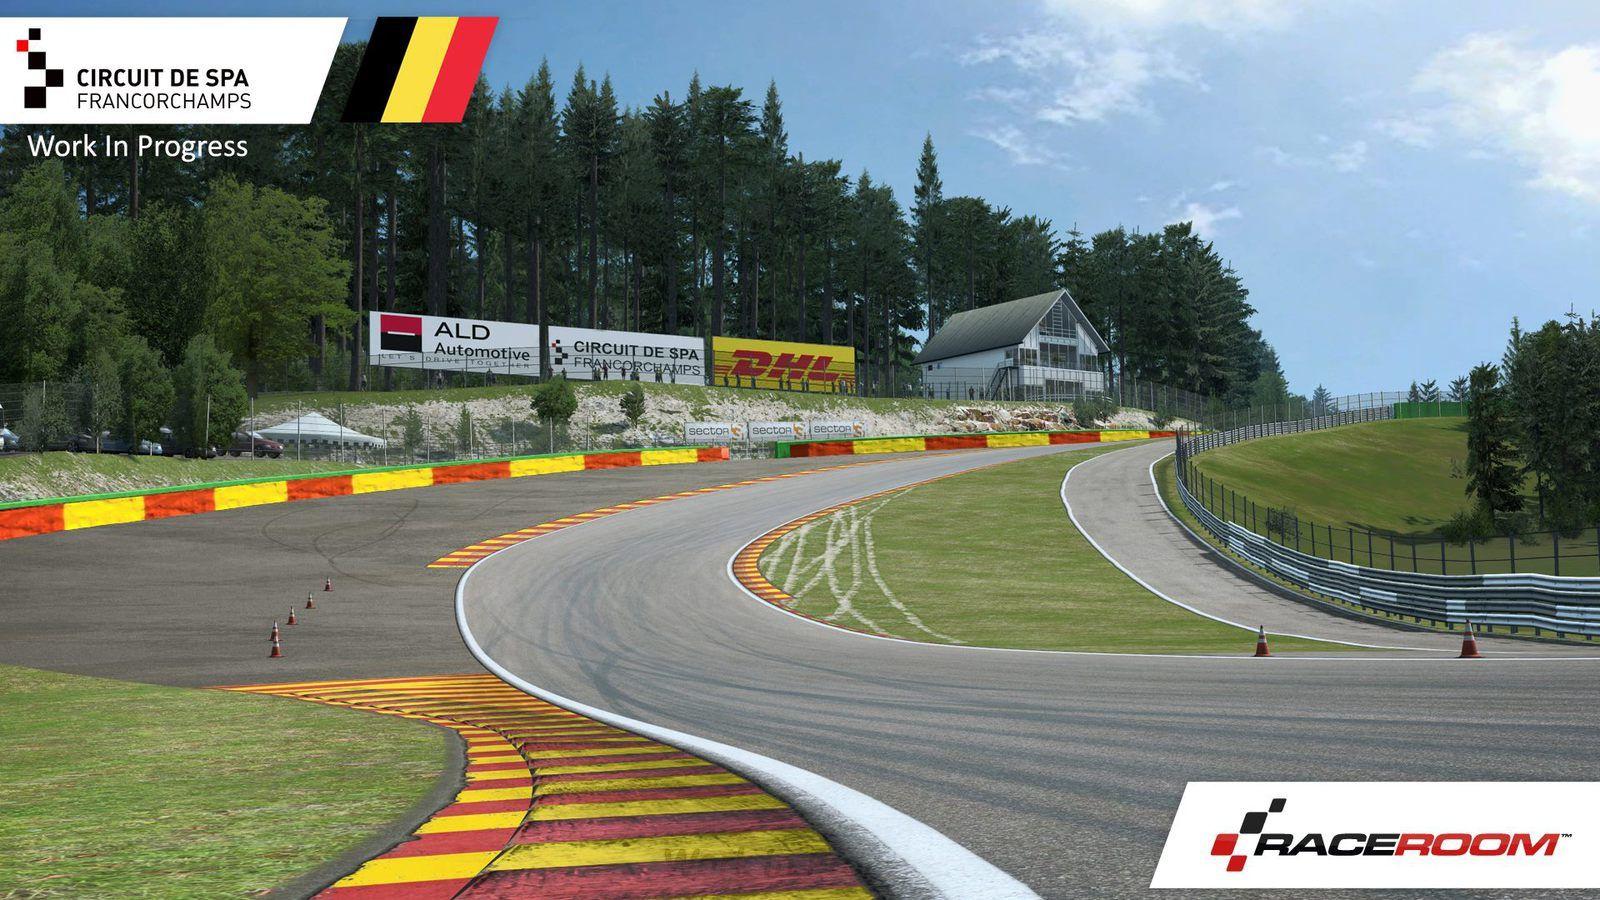 Raceroom - Spa-Francorchamps, ça avance !